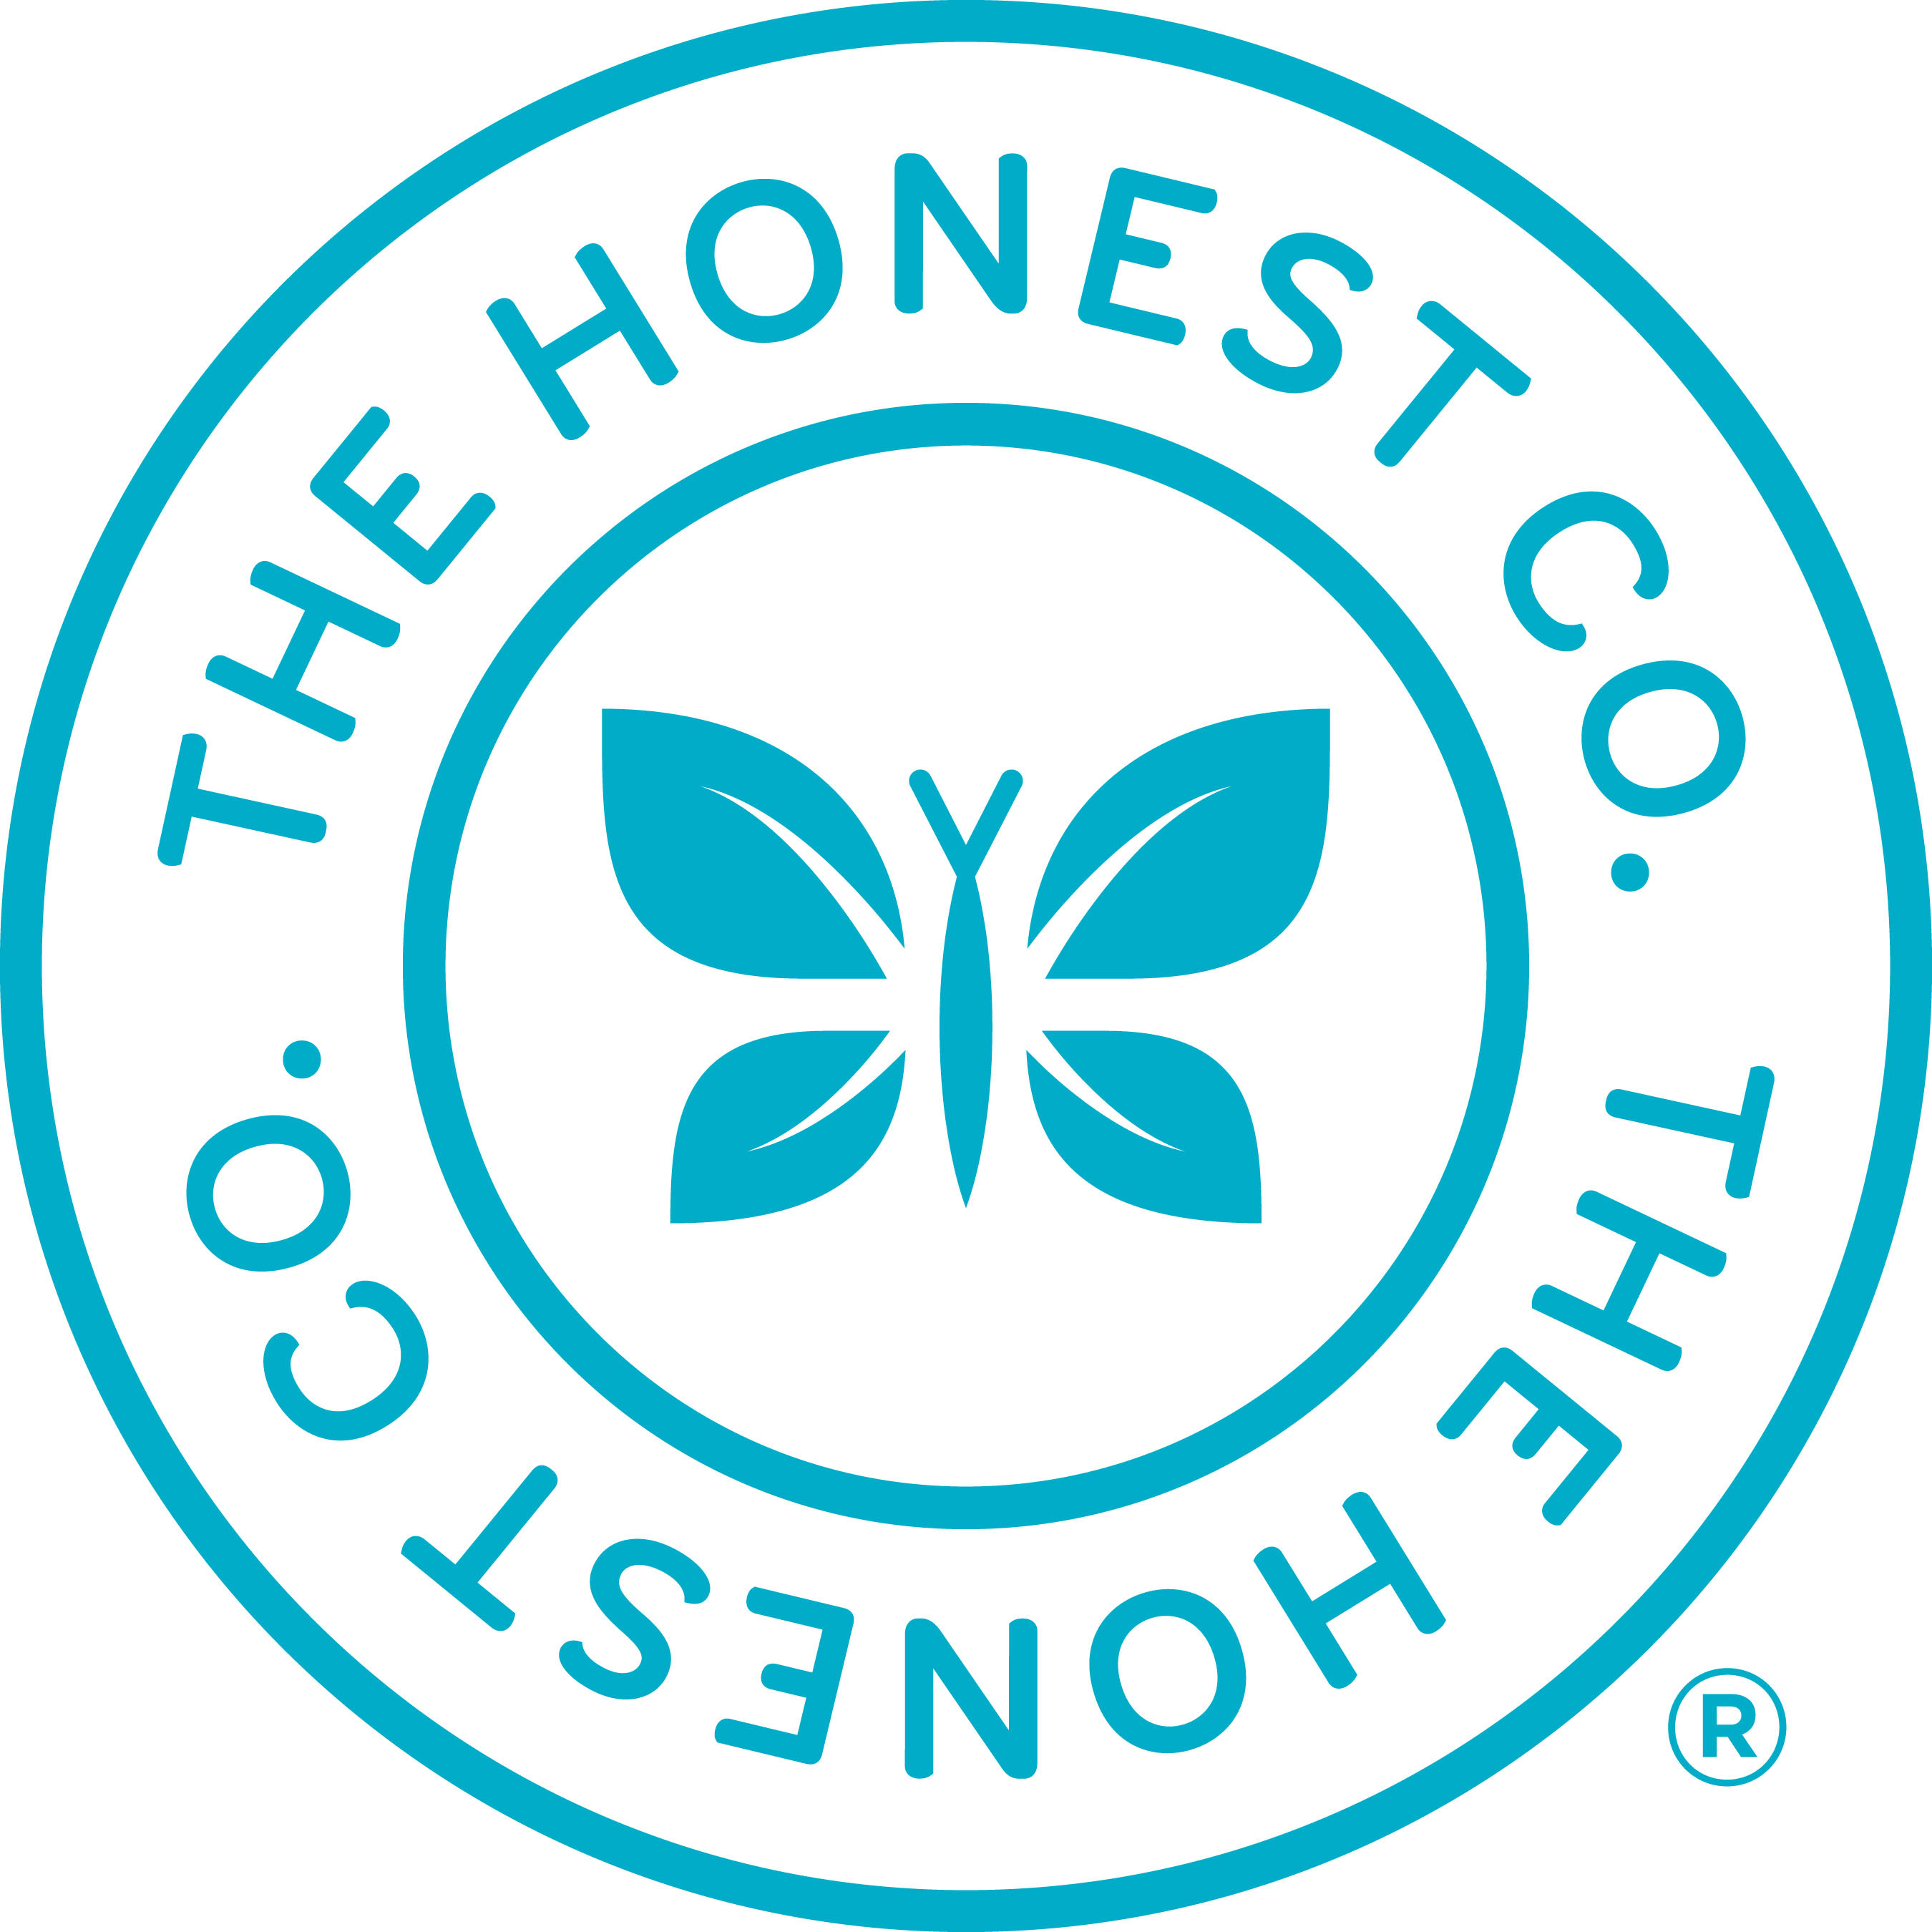 The Honest Company.